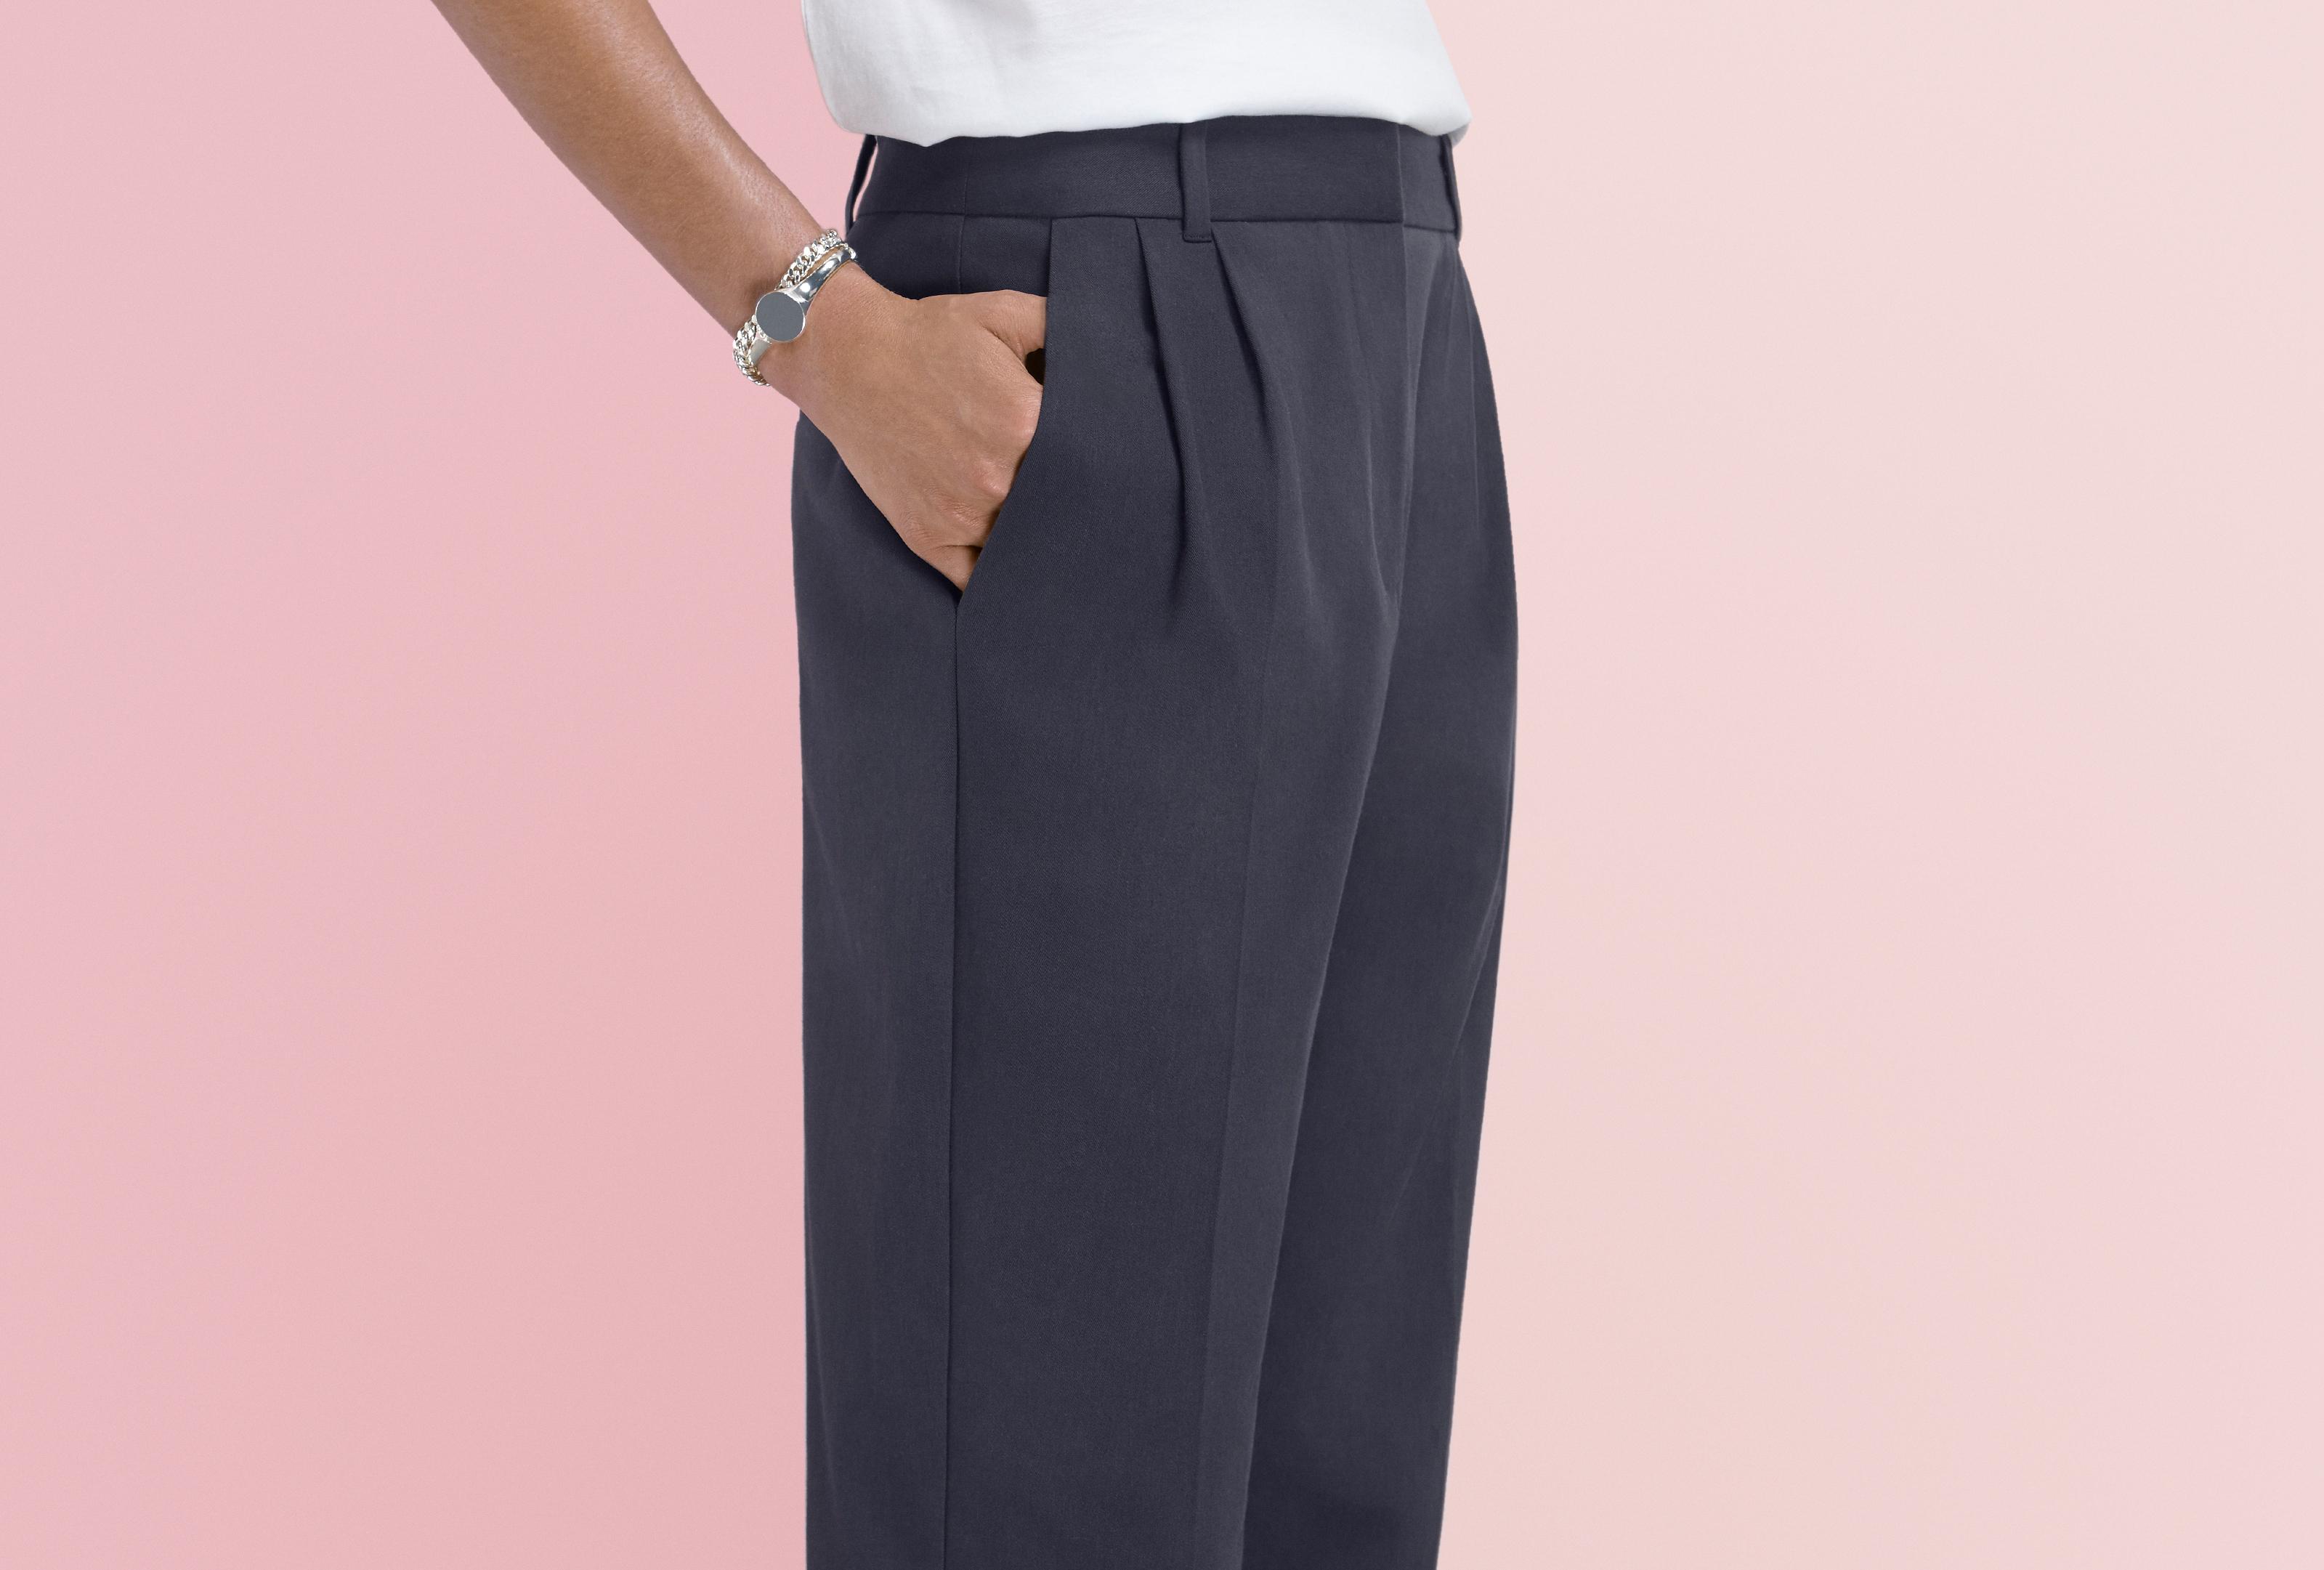 Boxmoor Pleated Peg Trousers Finery FE3u6Ax